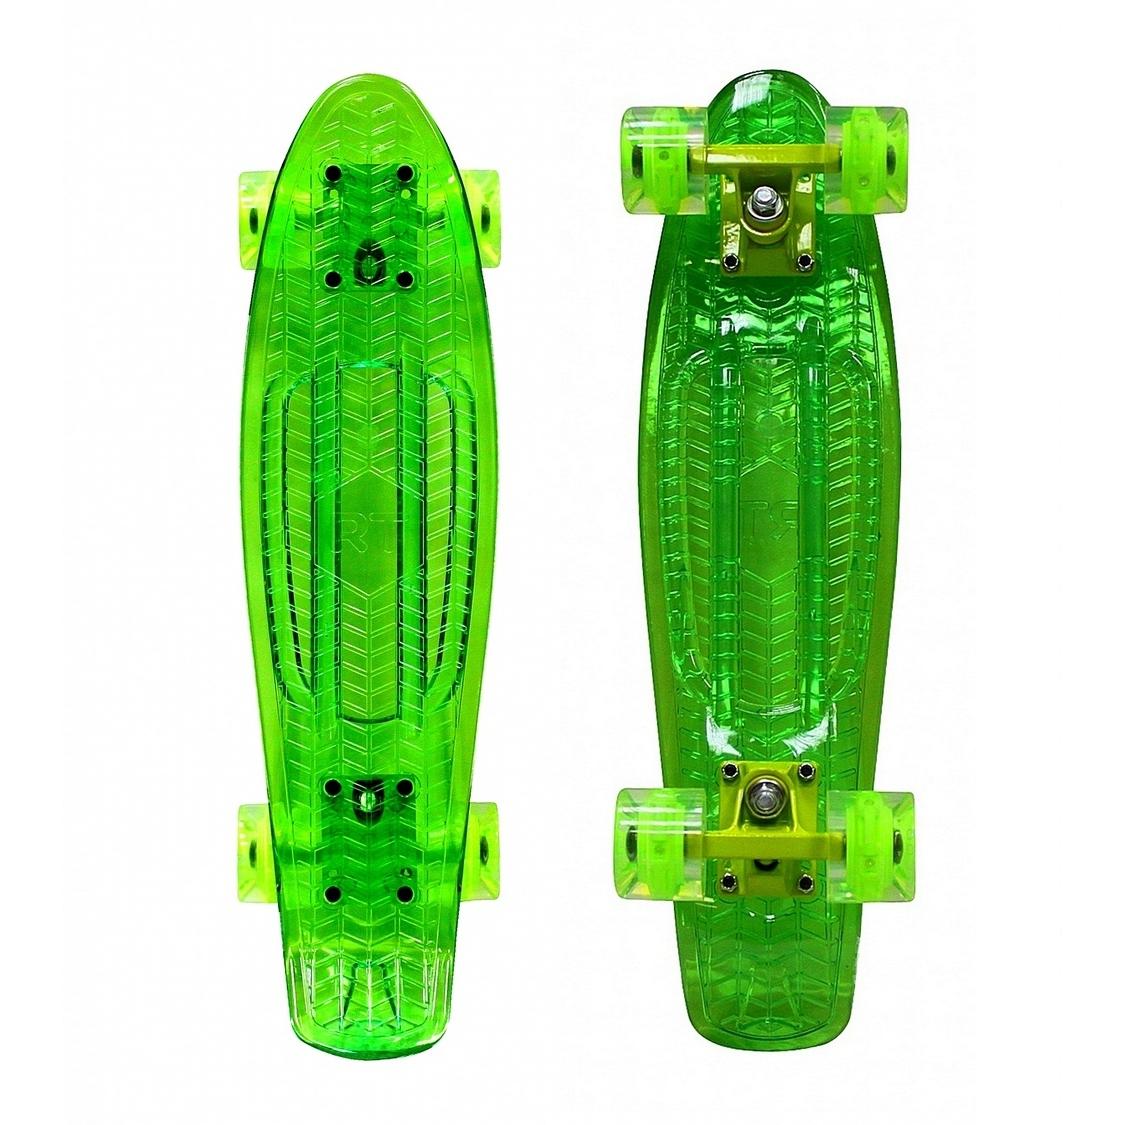 ��������� Y-Scoo Penny board Shine �� ����������� �������� Green